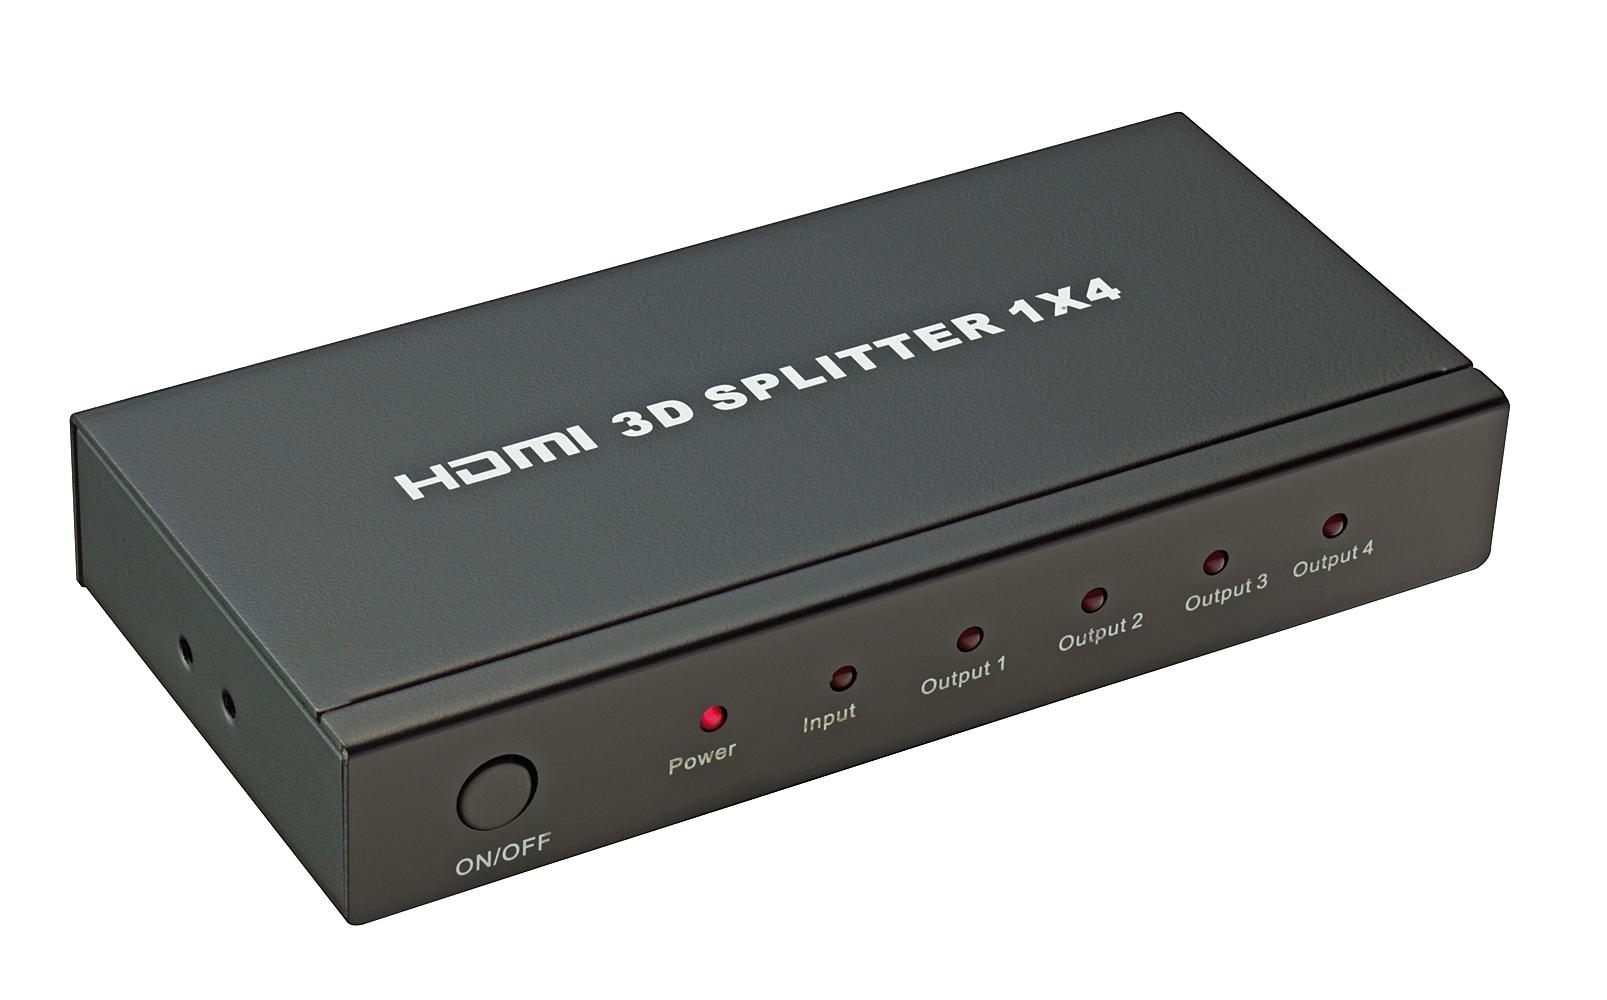 HDMI 4K UHD Splitter 4 Port 3D, 2160p30